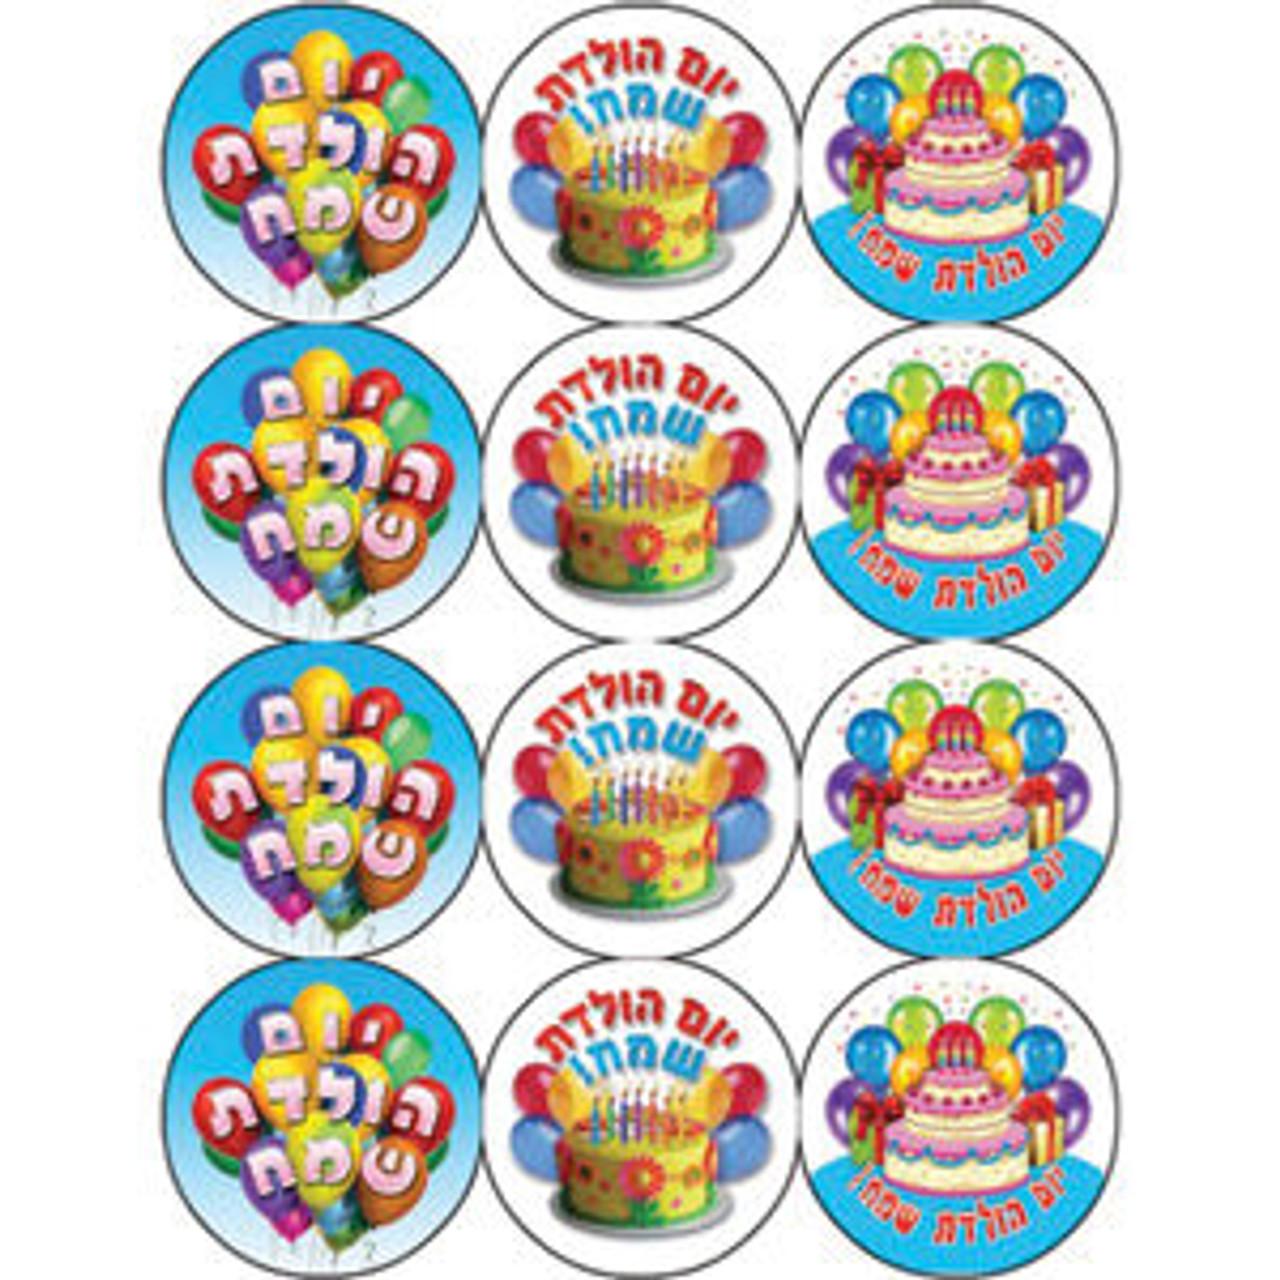 Happy Birthday Hebrew Stickers Buy At The Jewish School Supply Company